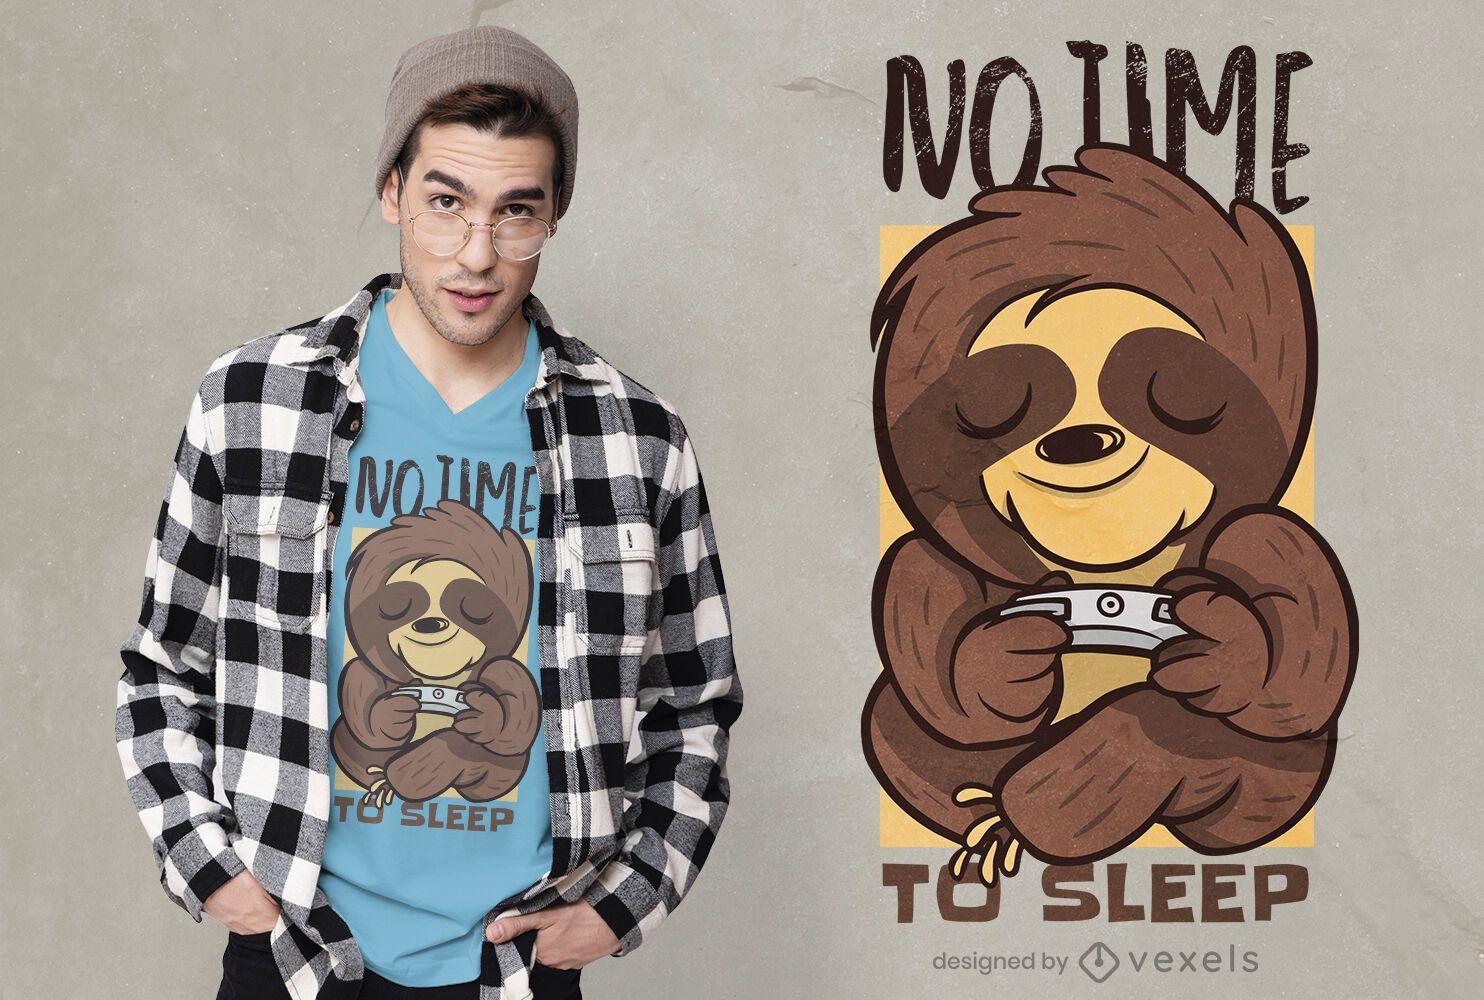 Gamer sloth t-shirt design